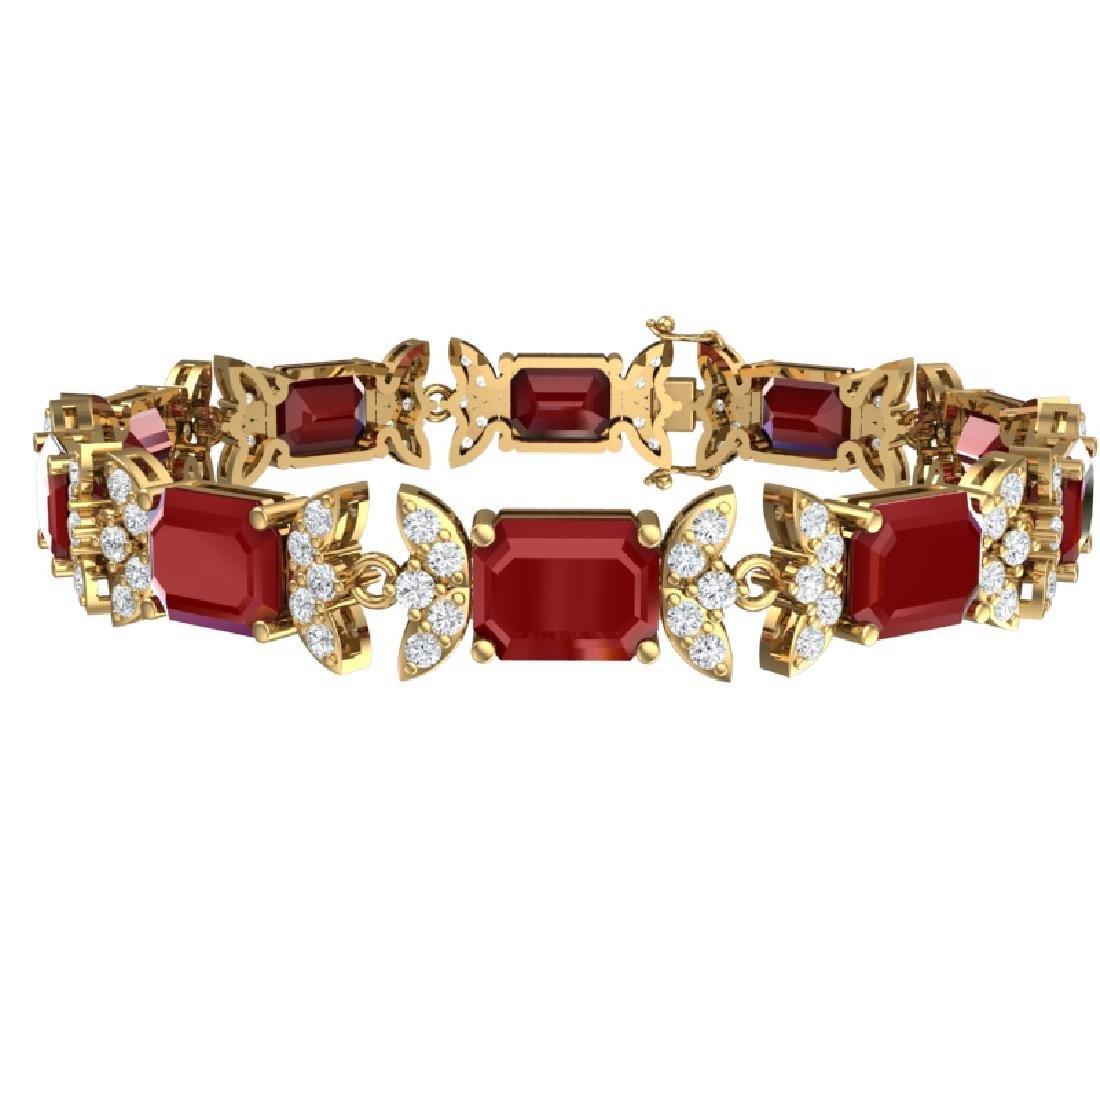 38.13 CTW Royalty Ruby & VS Diamond Bracelet 18K Yellow - 2